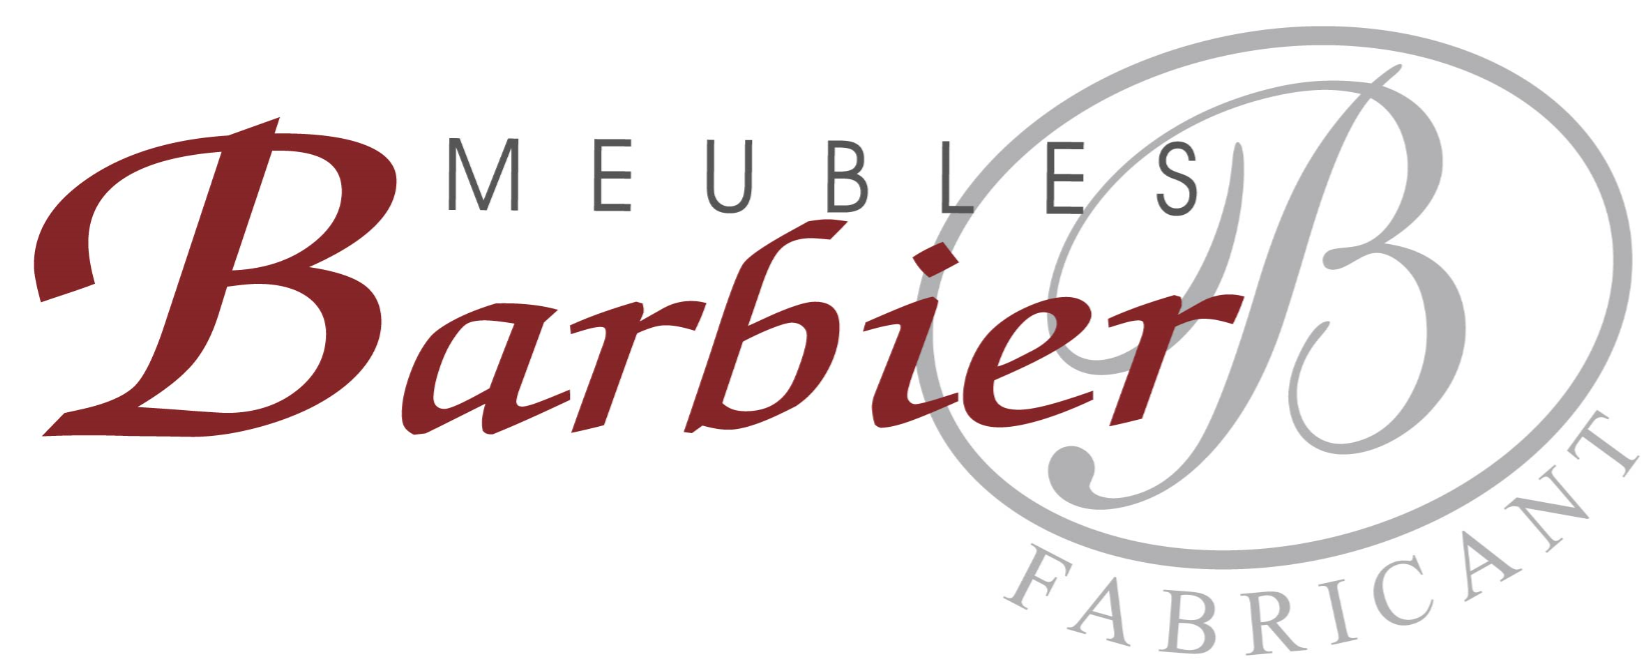 Meubles Barbier